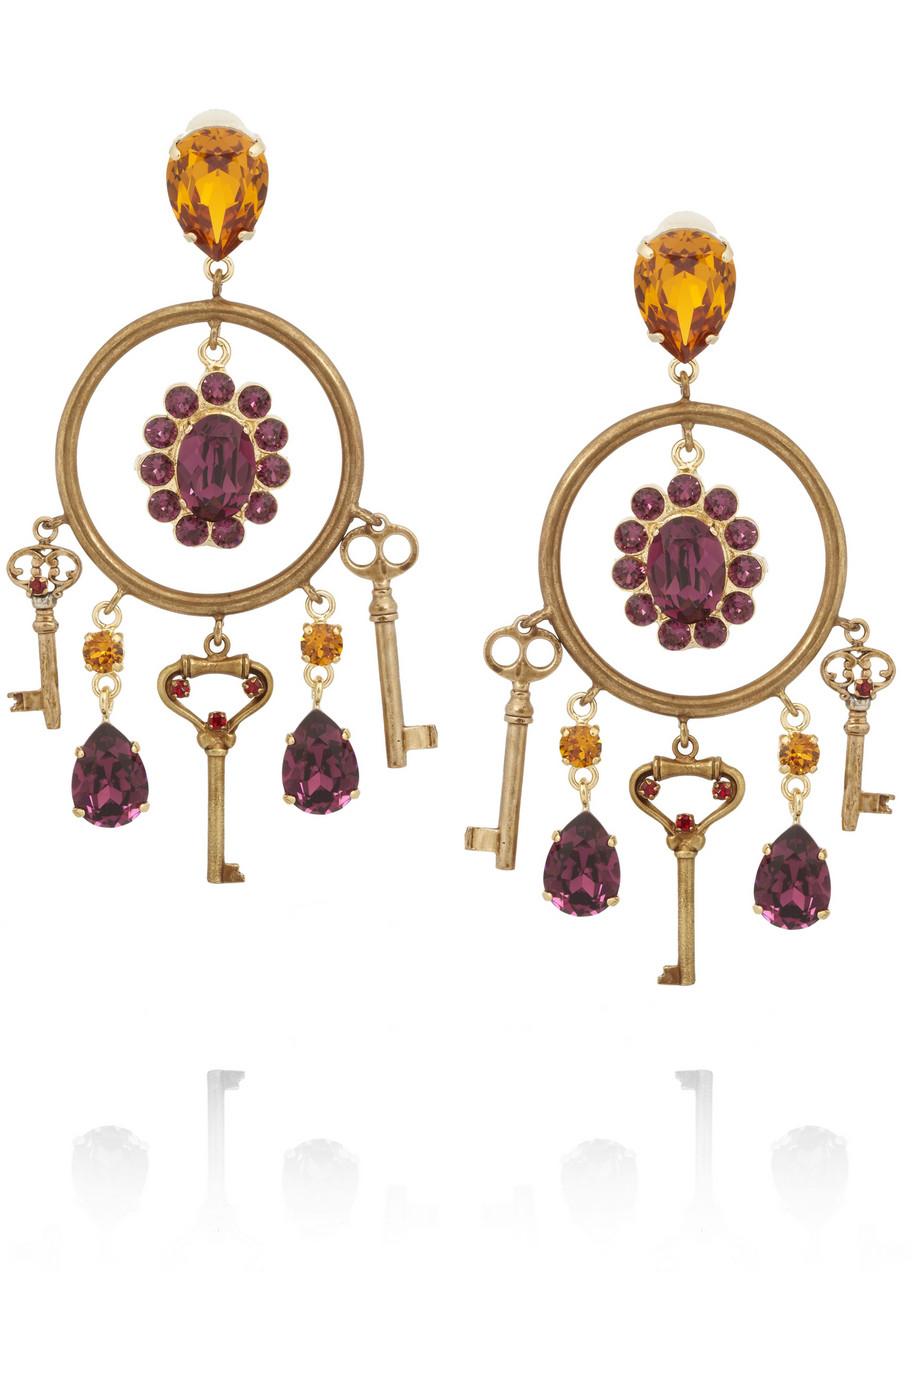 1153e630f Lyst - Dolce & Gabbana Gold-Plated Swarovski Crystal Clip Earrings ...